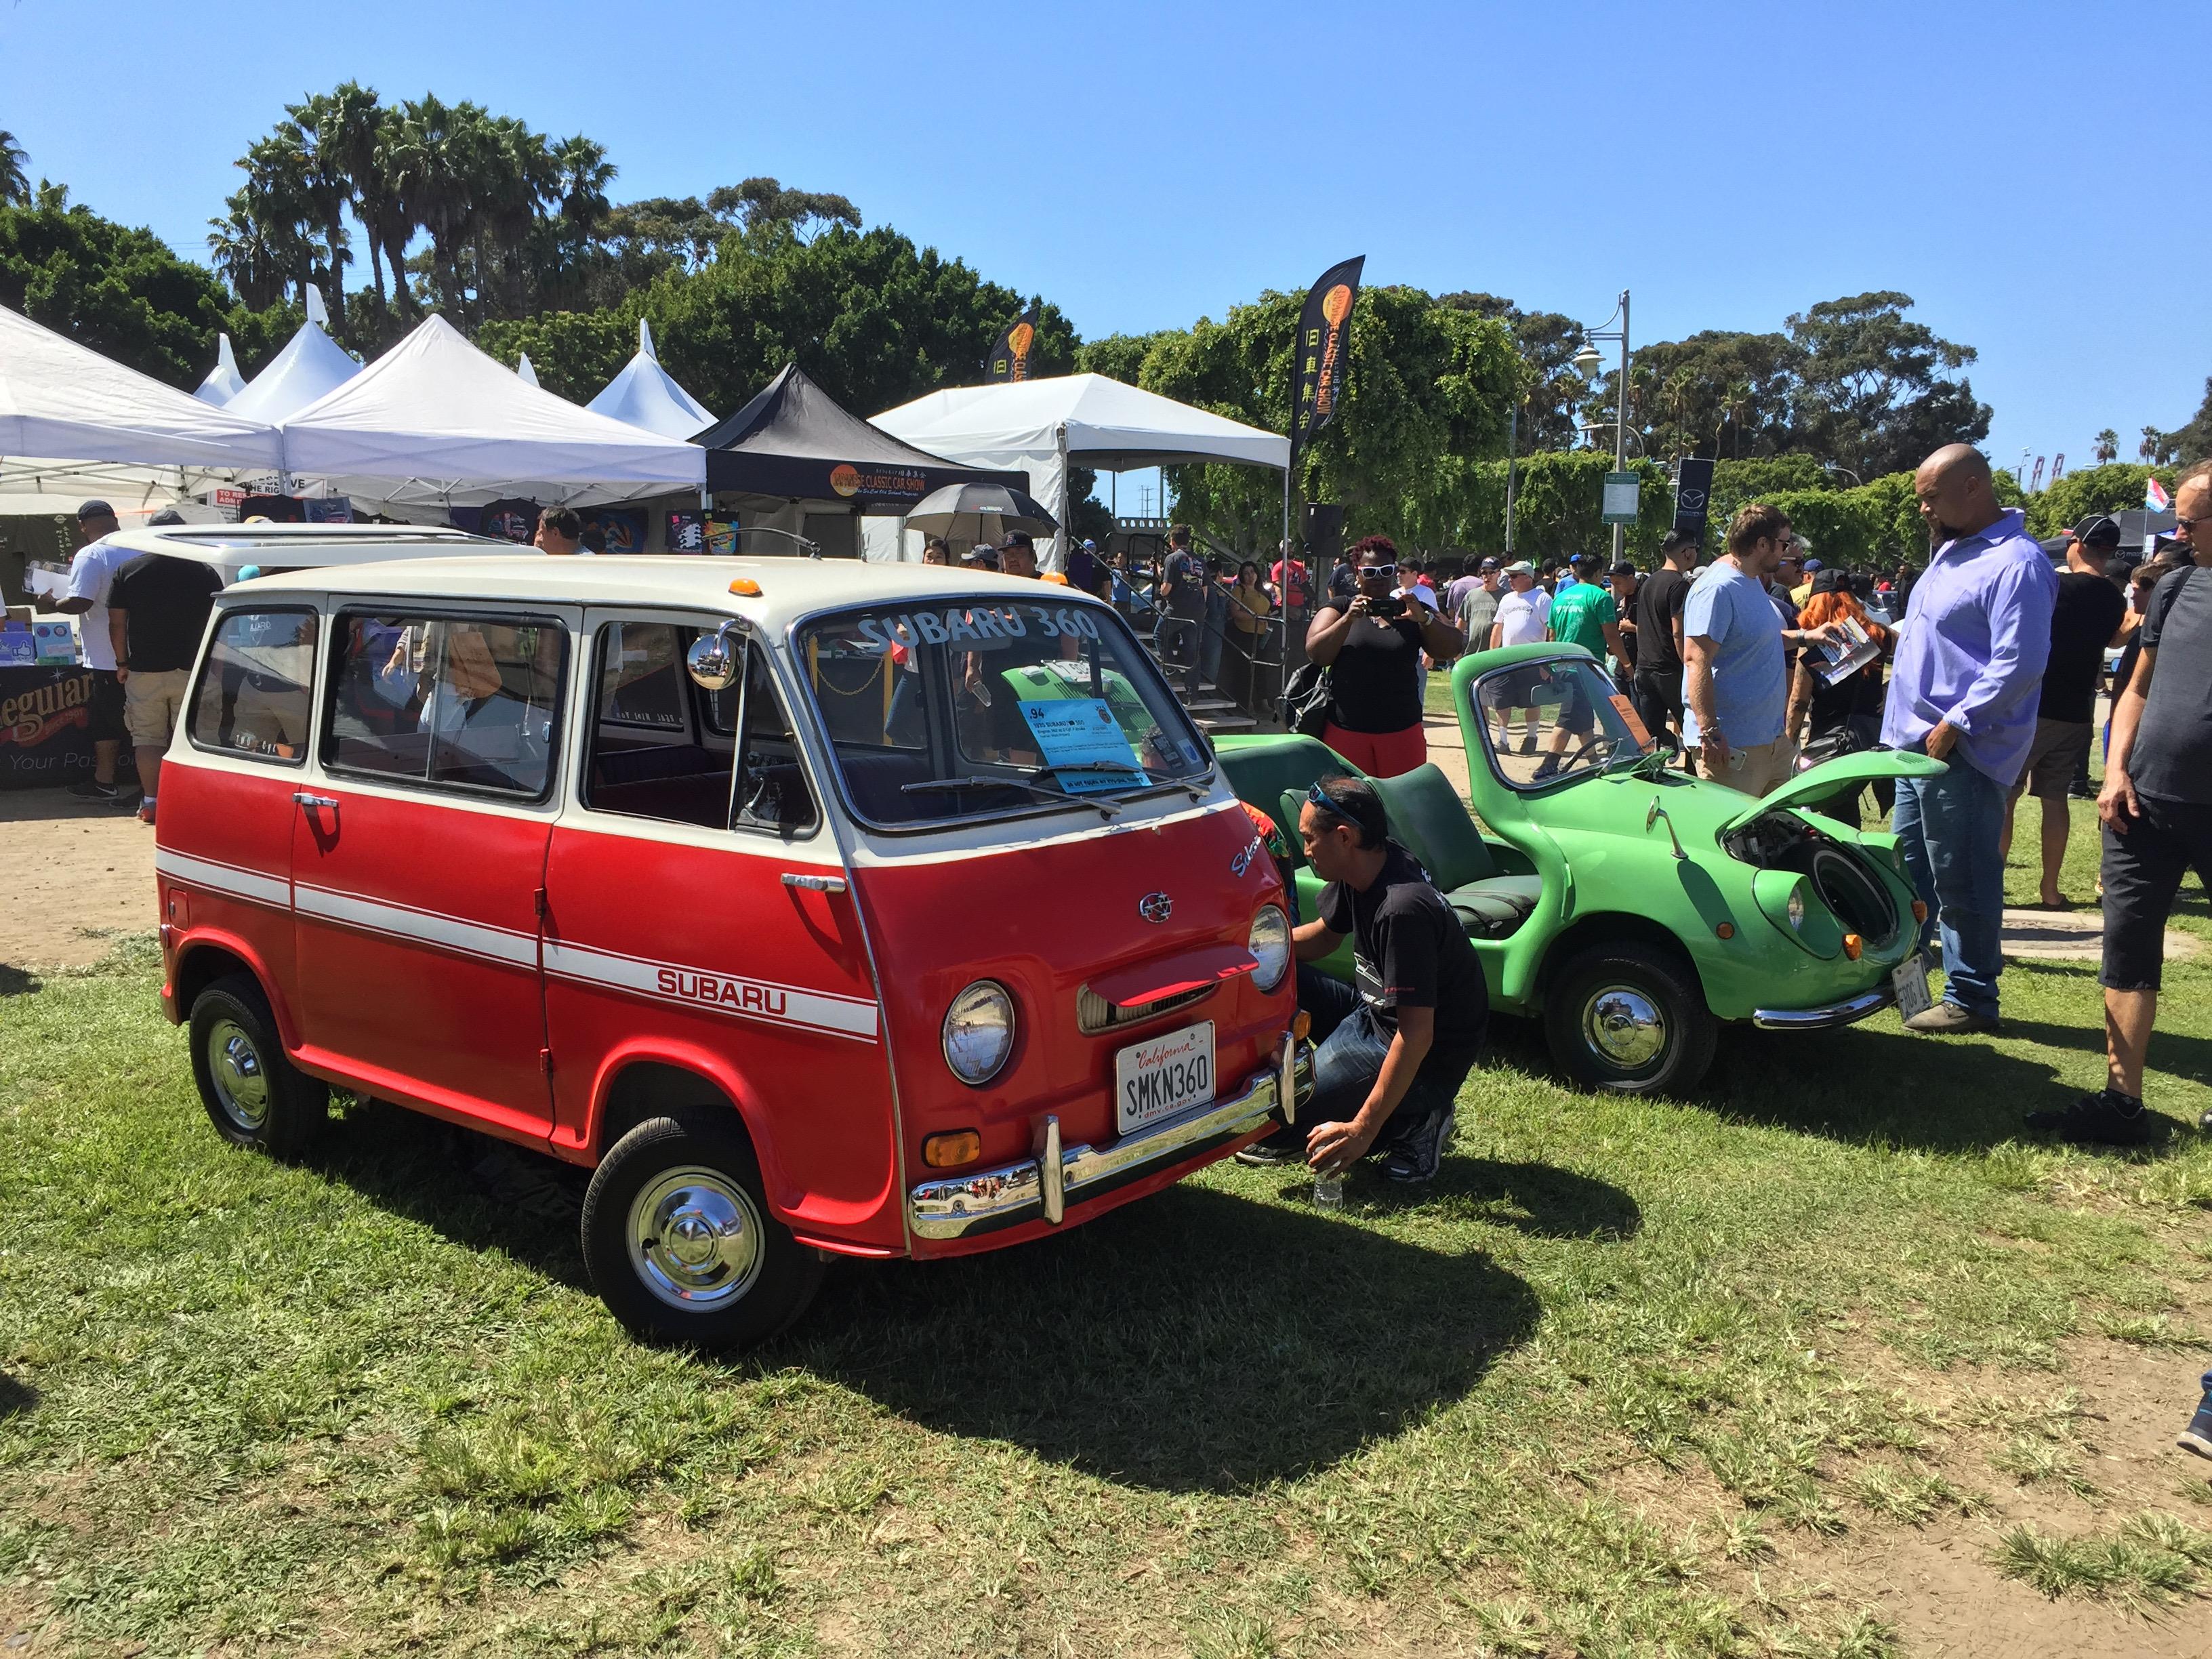 Subaru Bus And Beach ClassicCarscom Journal - Subaru car show california